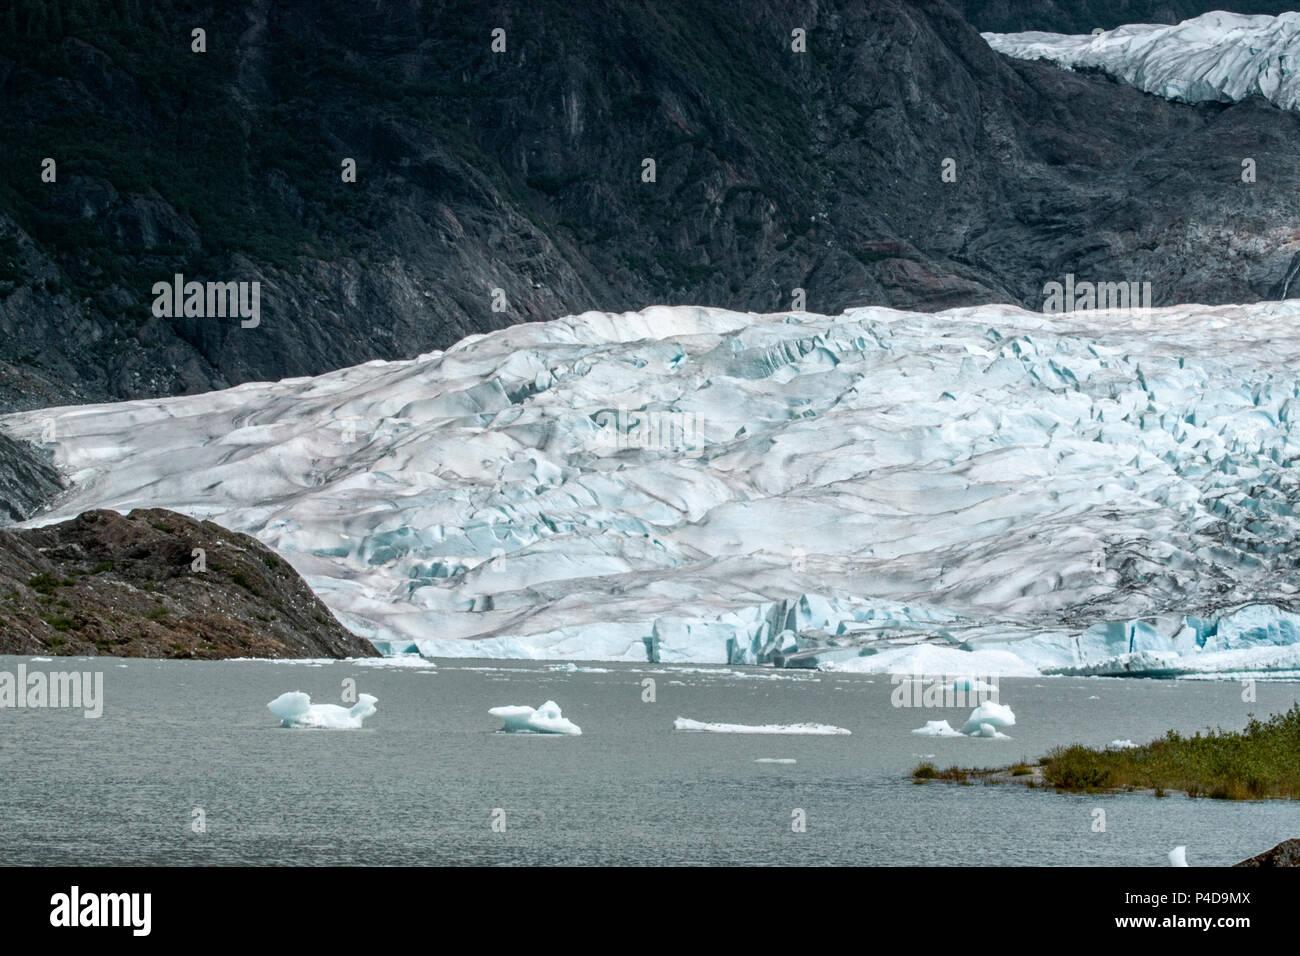 Mendenhall glacier mountain nature outdoors Alaska ice glacial - Stock Image